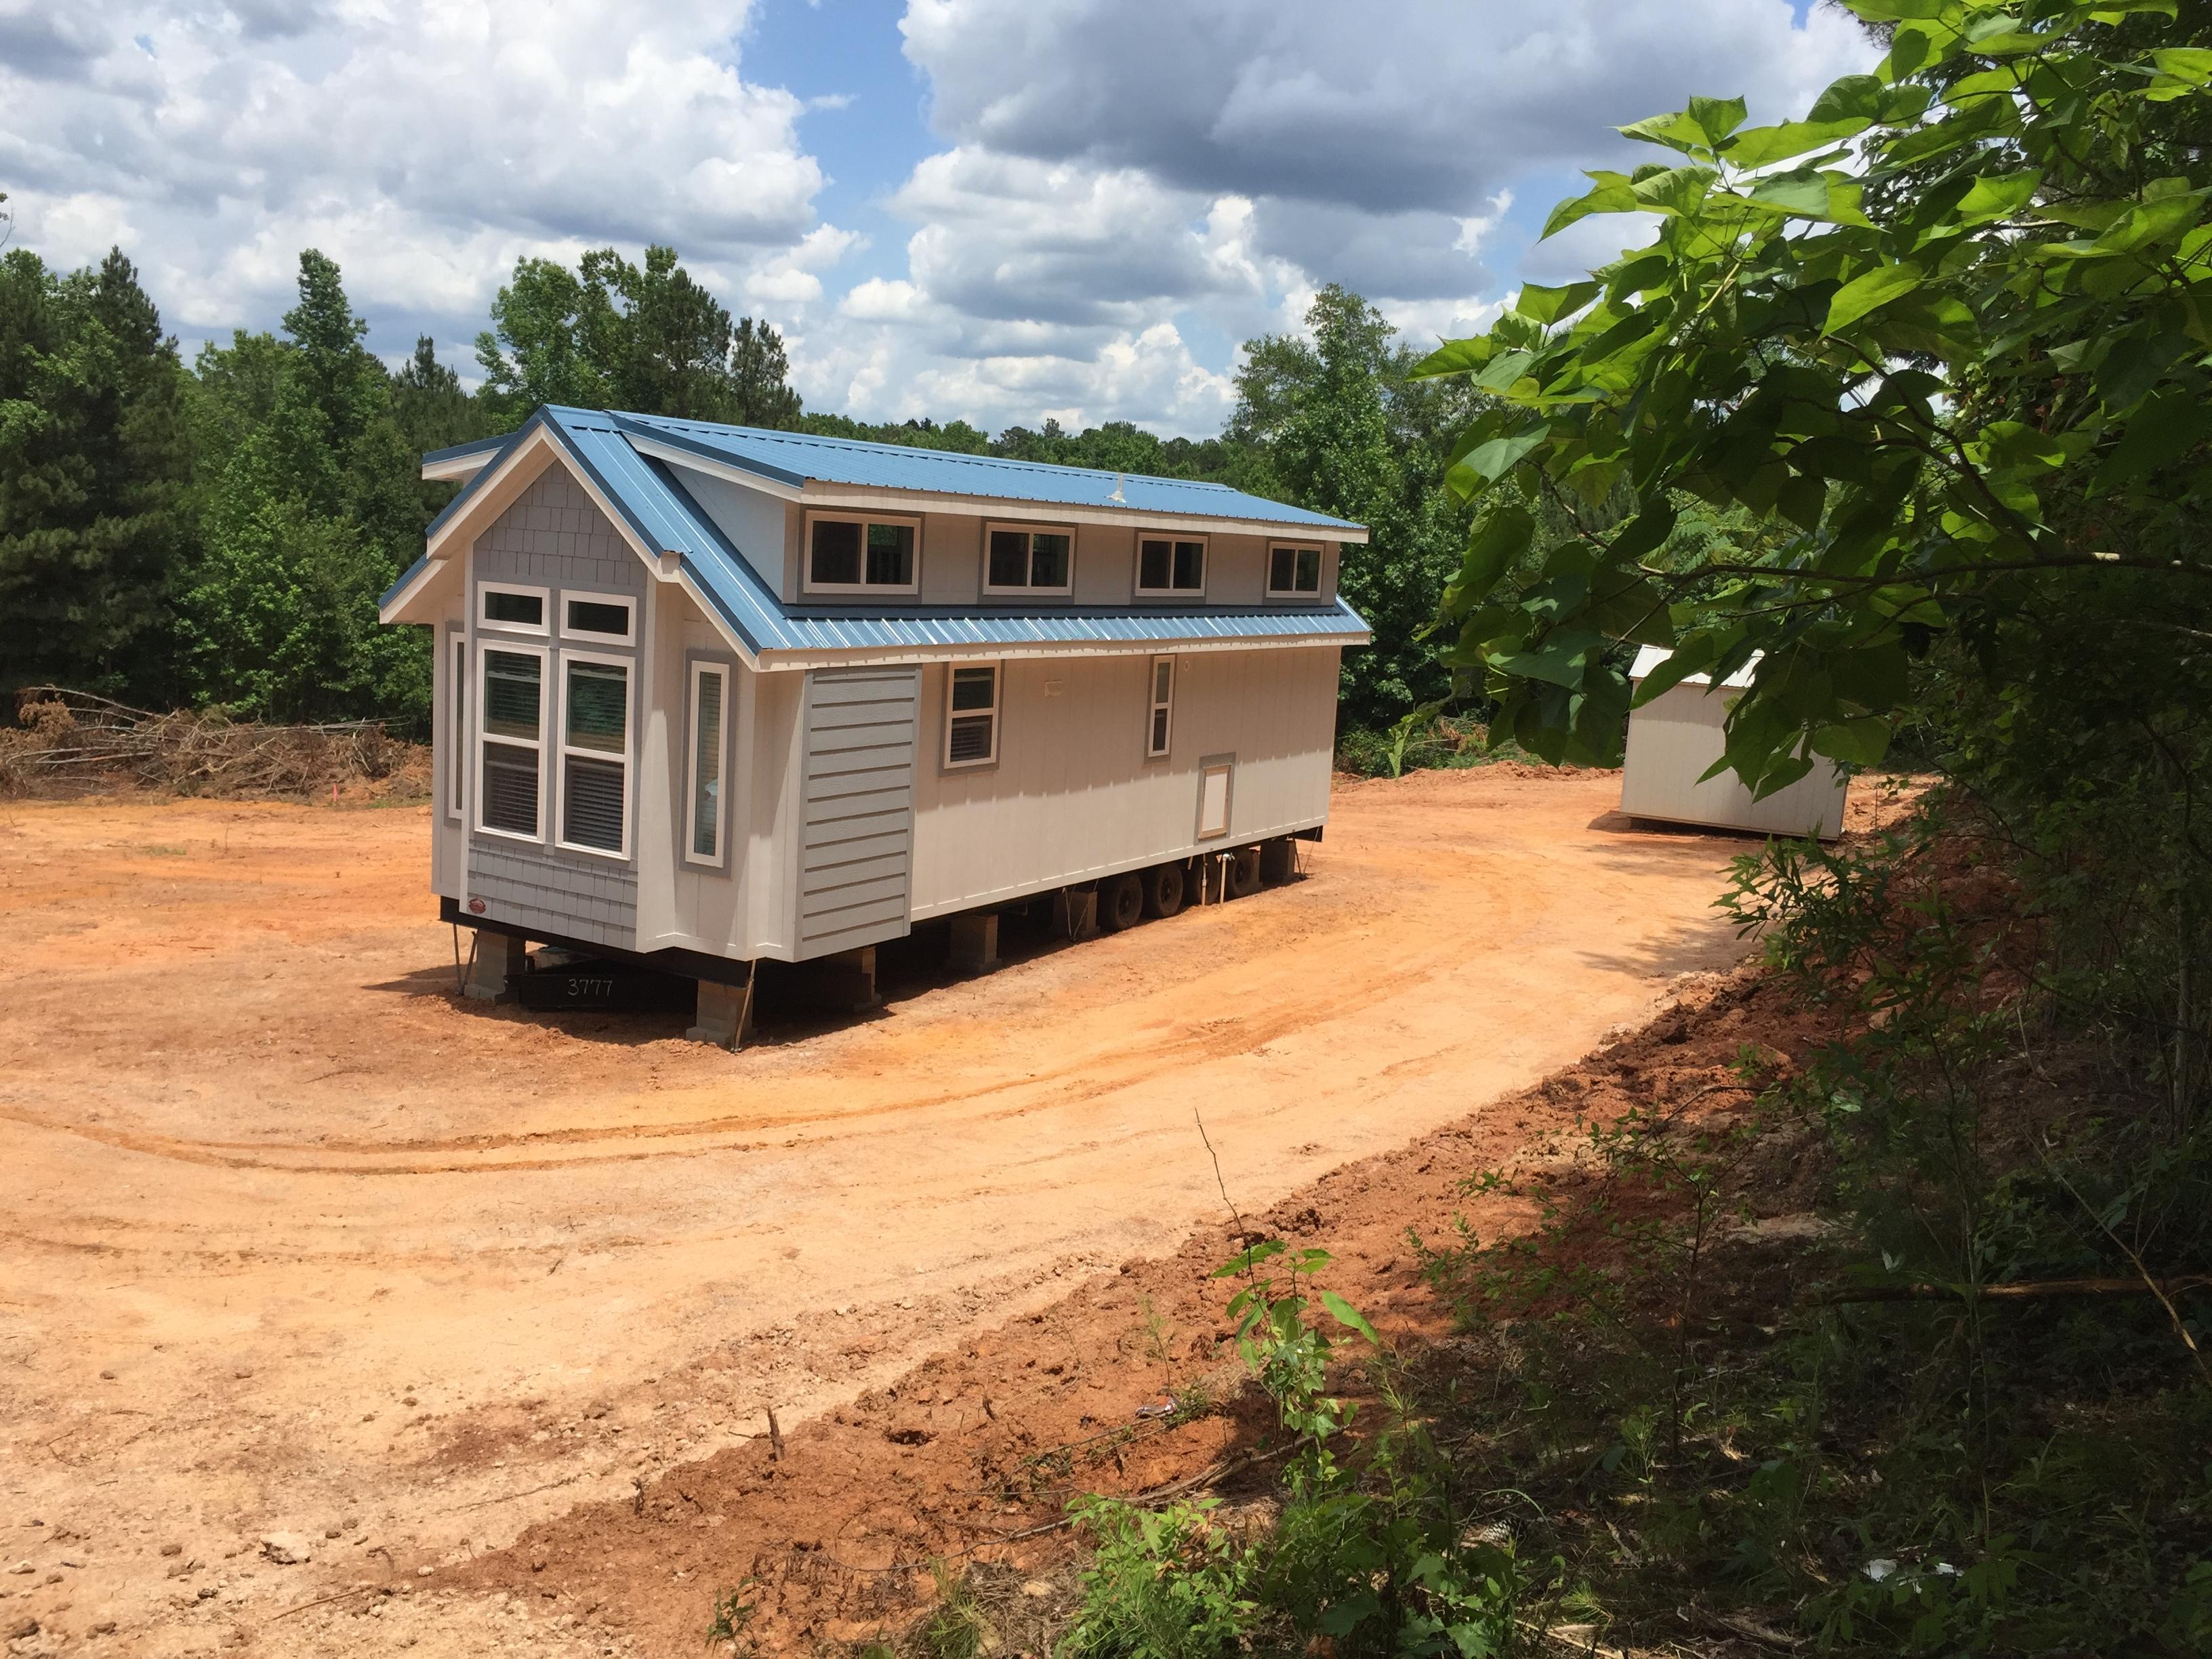 Building A House For Under 50k Millionacres